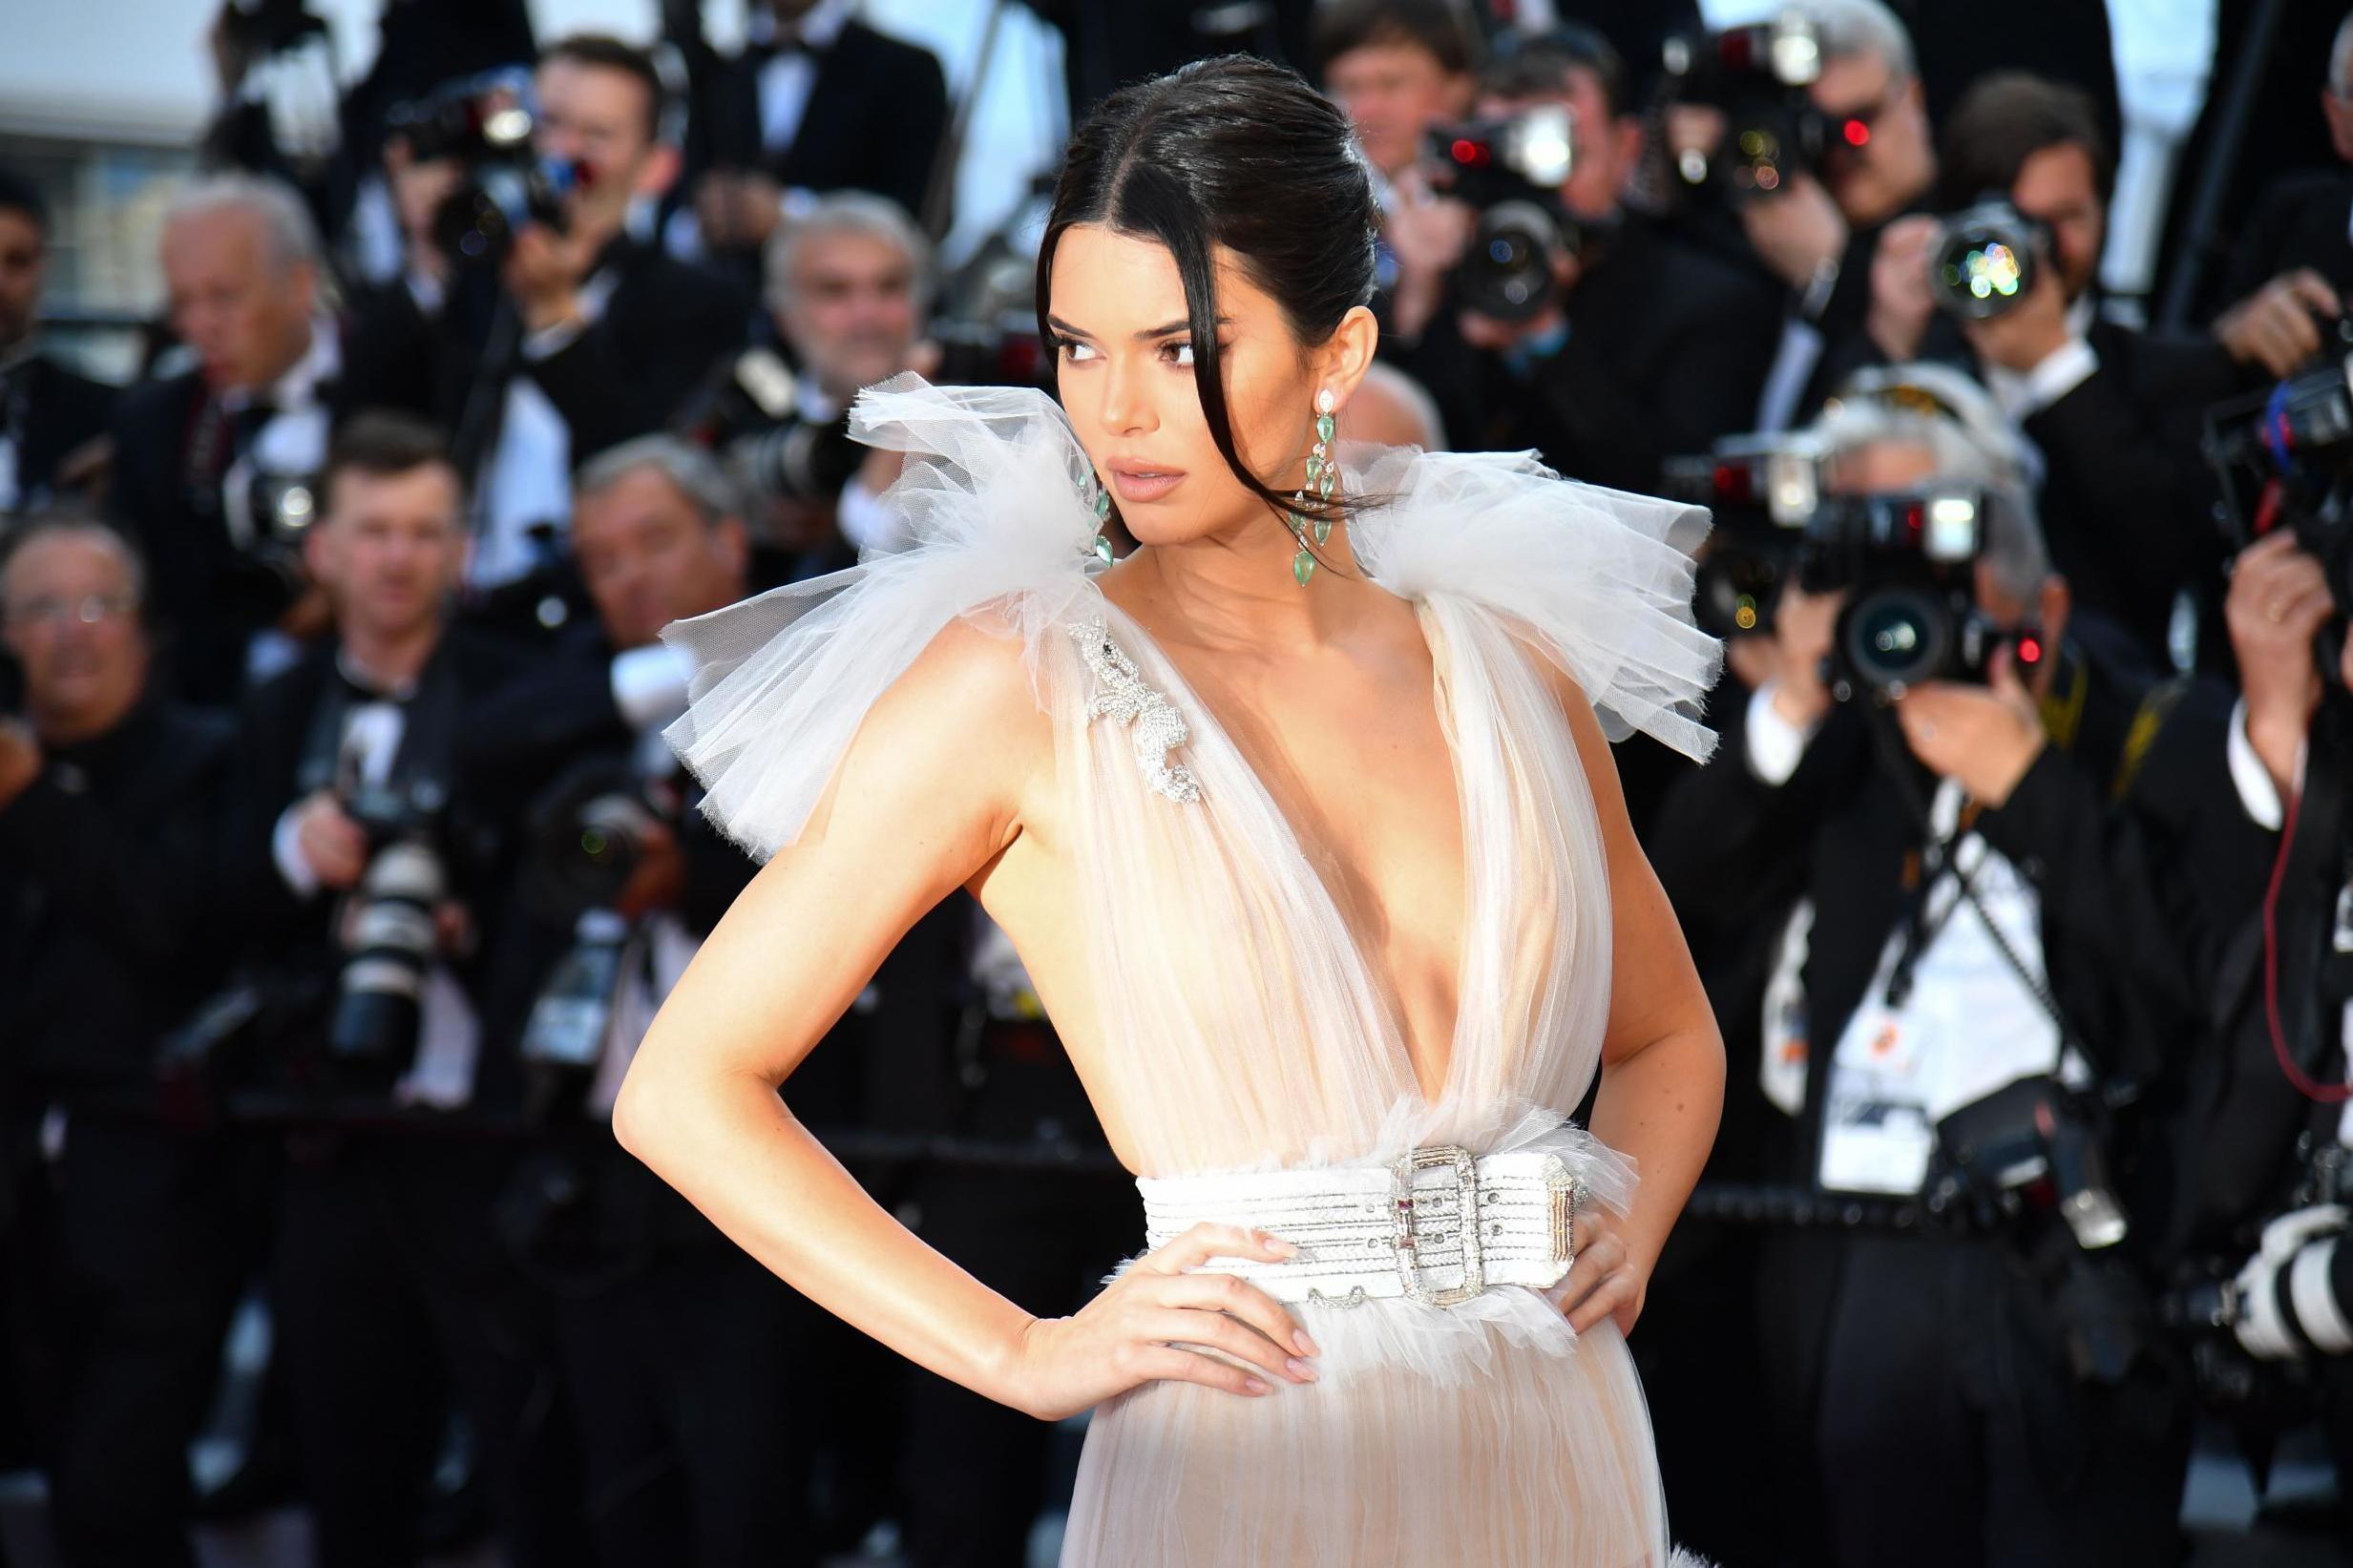 Sun, sex' and Prada at the Cannes Film Festival